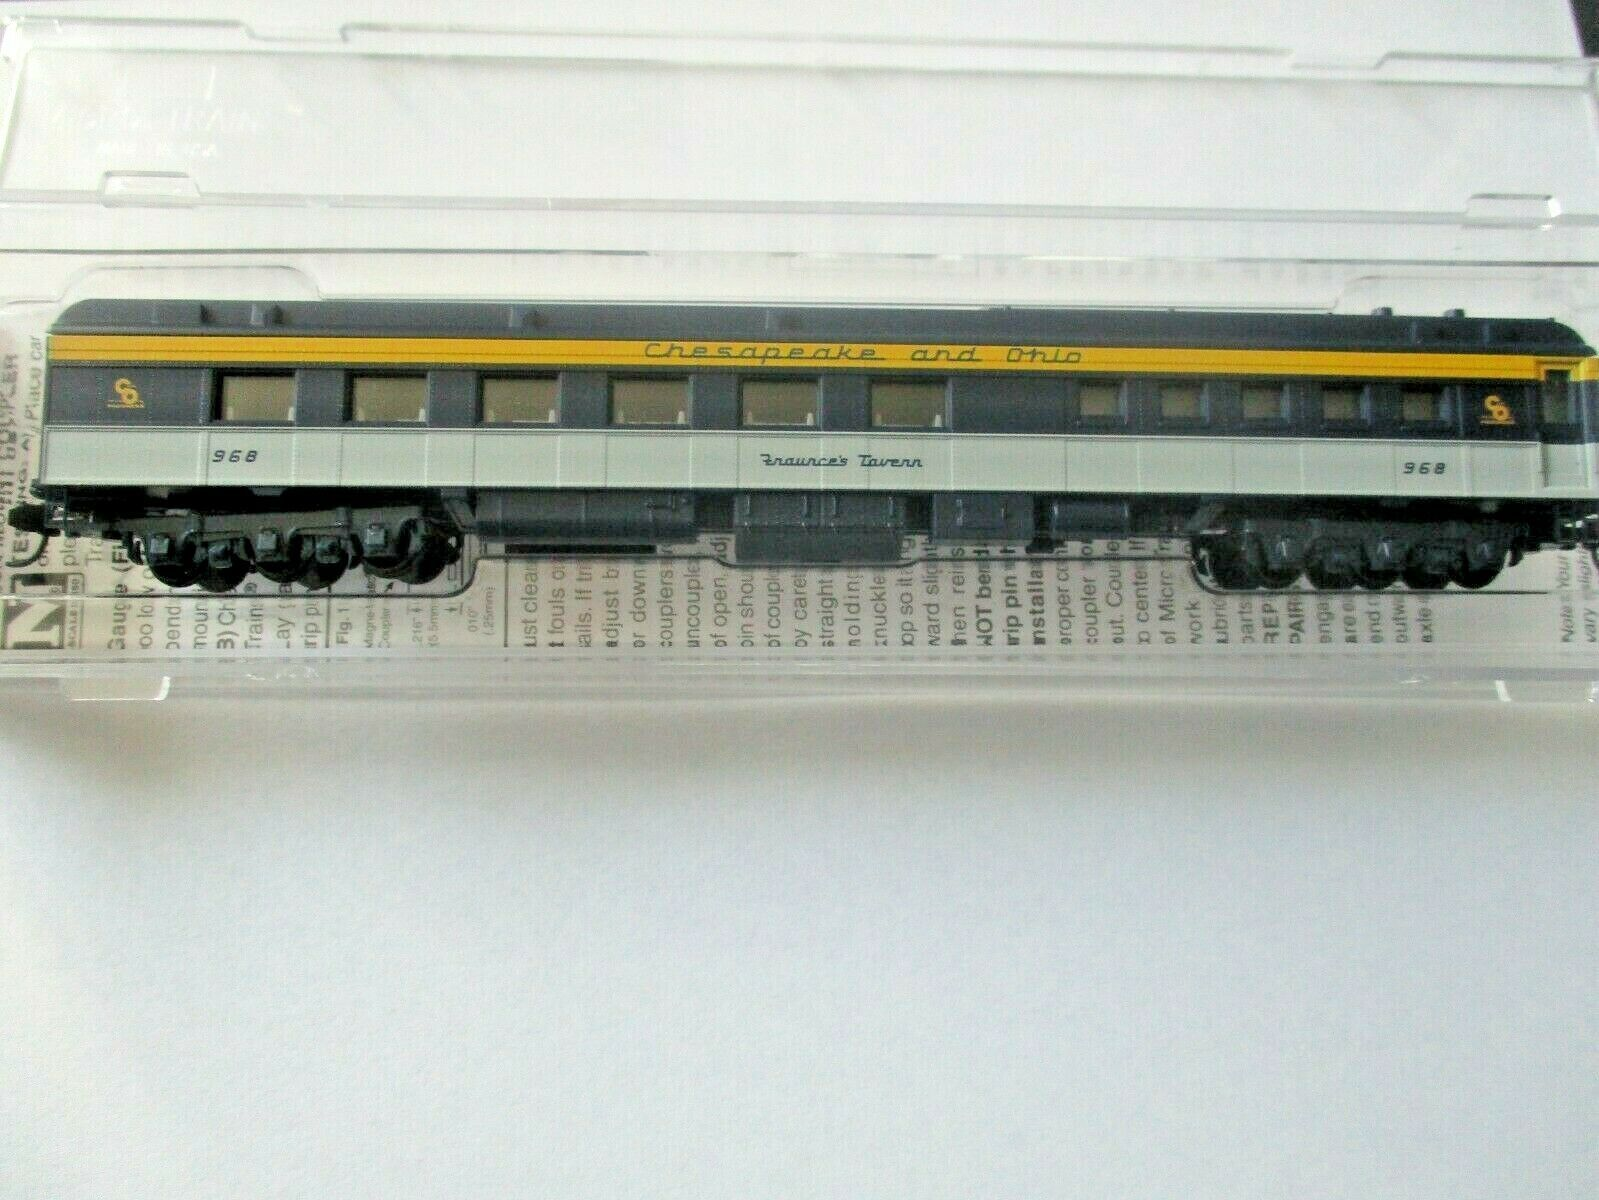 Micro-Trains # 14600410 Chesapeake & Ohio 80' Heavyweight Diner Car N-Scale